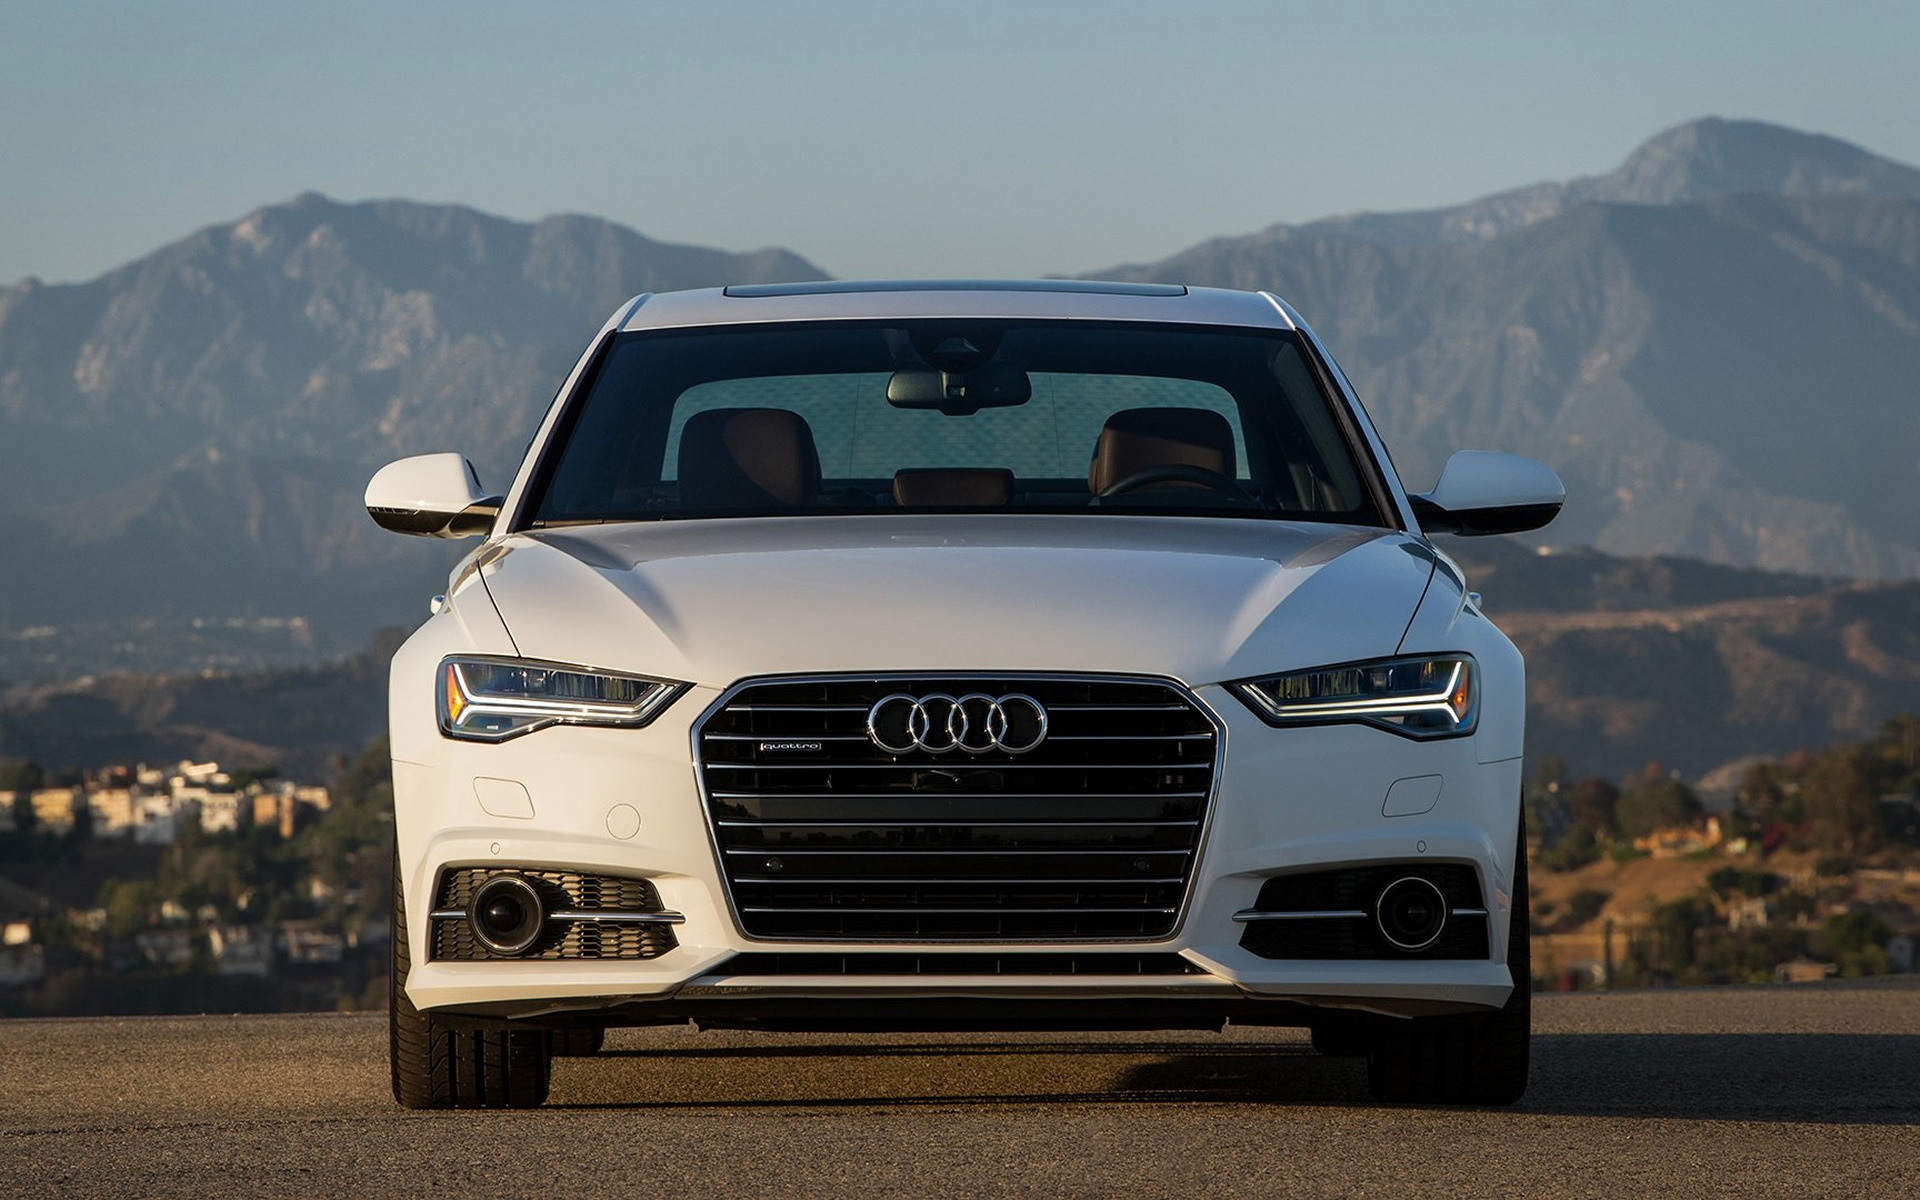 audi-a-sedan-Audi-A-Sedan-S-Line-Us-And-Hd-Images-for-Audi-A-Sedan-wallpaper-wp3602800